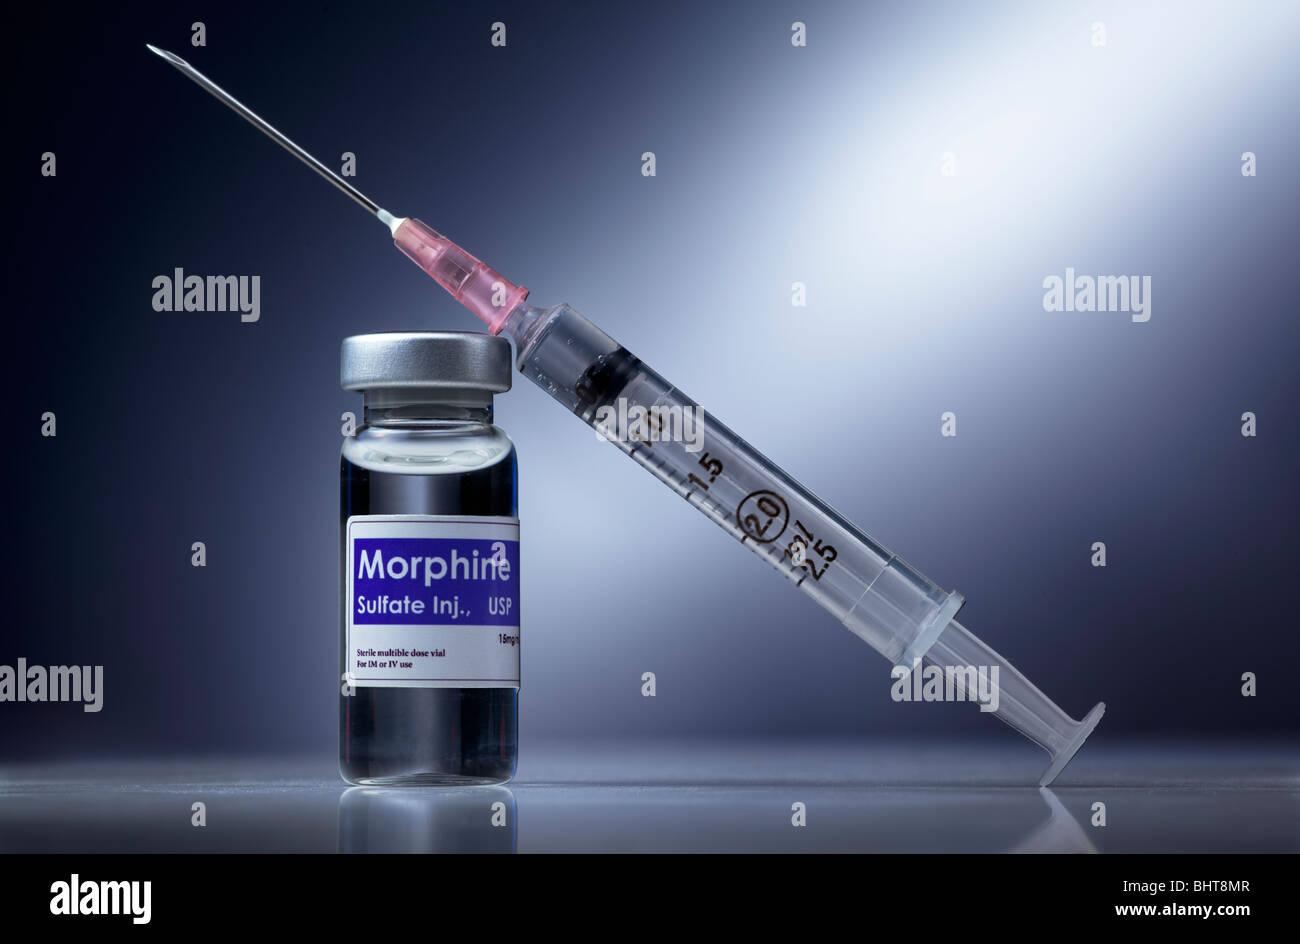 Syringe and morphine - Stock Image